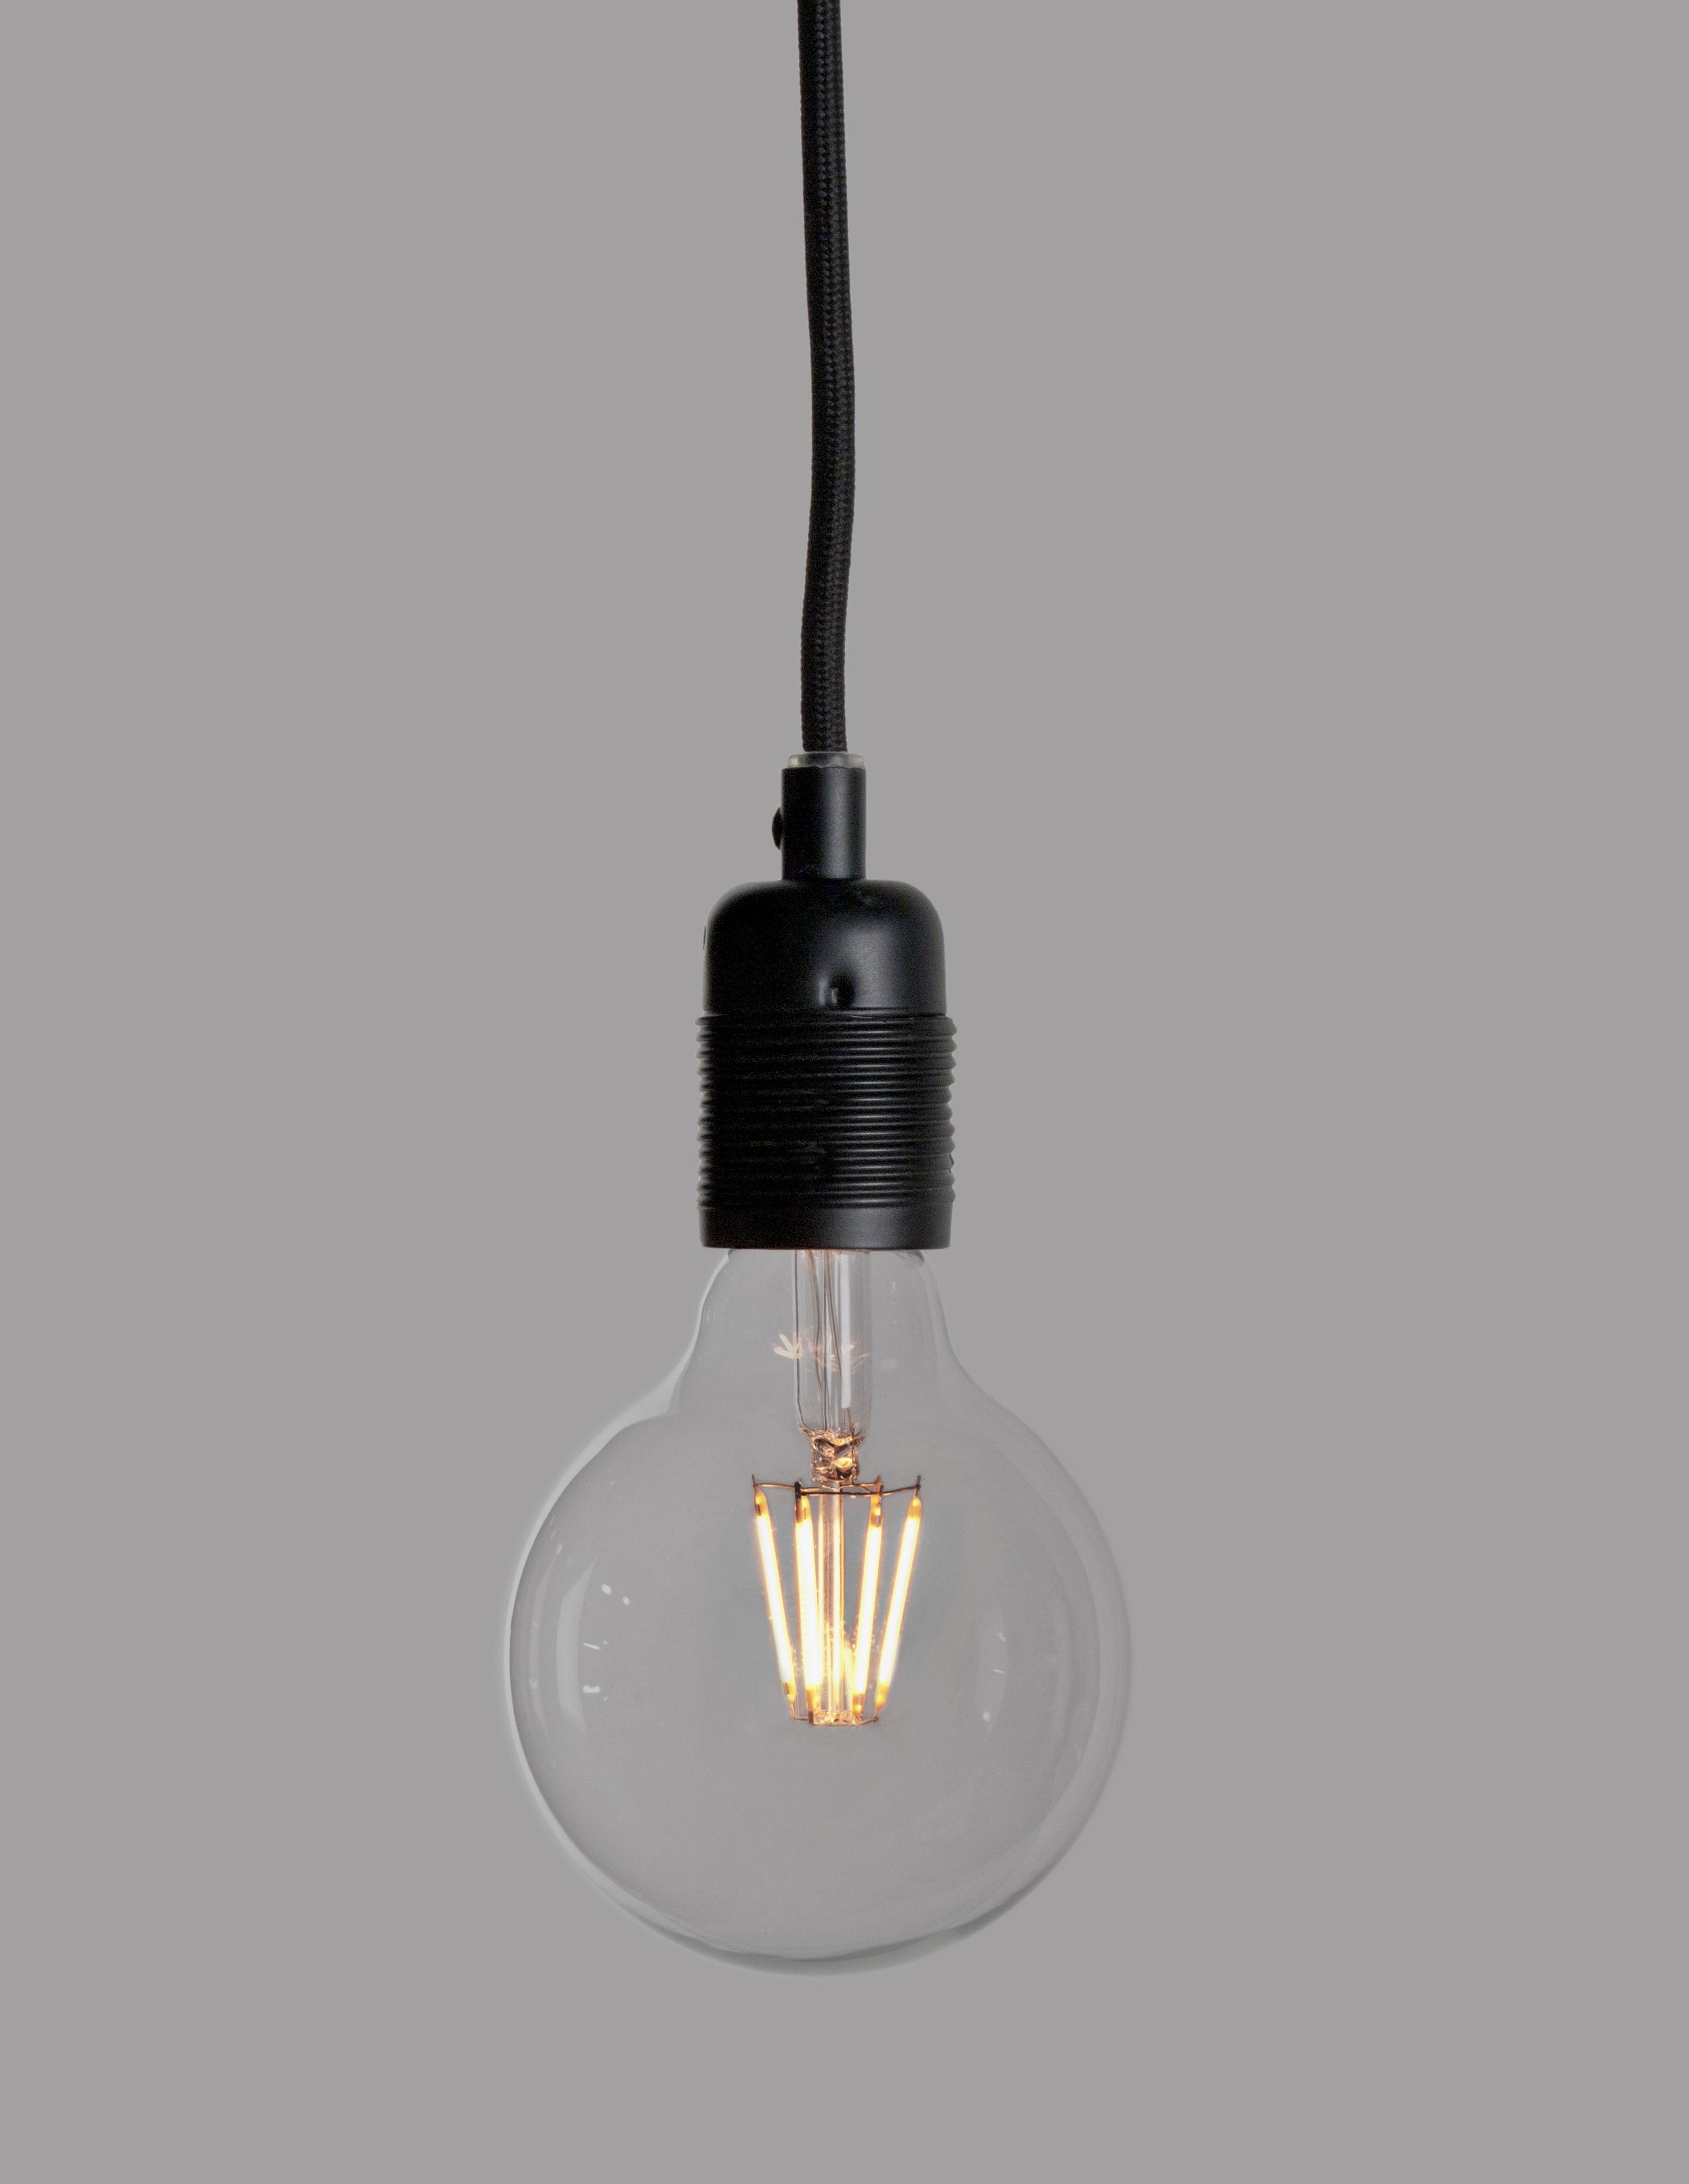 g95 ampoule led filaments e27 6w transparent gold by pop corn. Black Bedroom Furniture Sets. Home Design Ideas